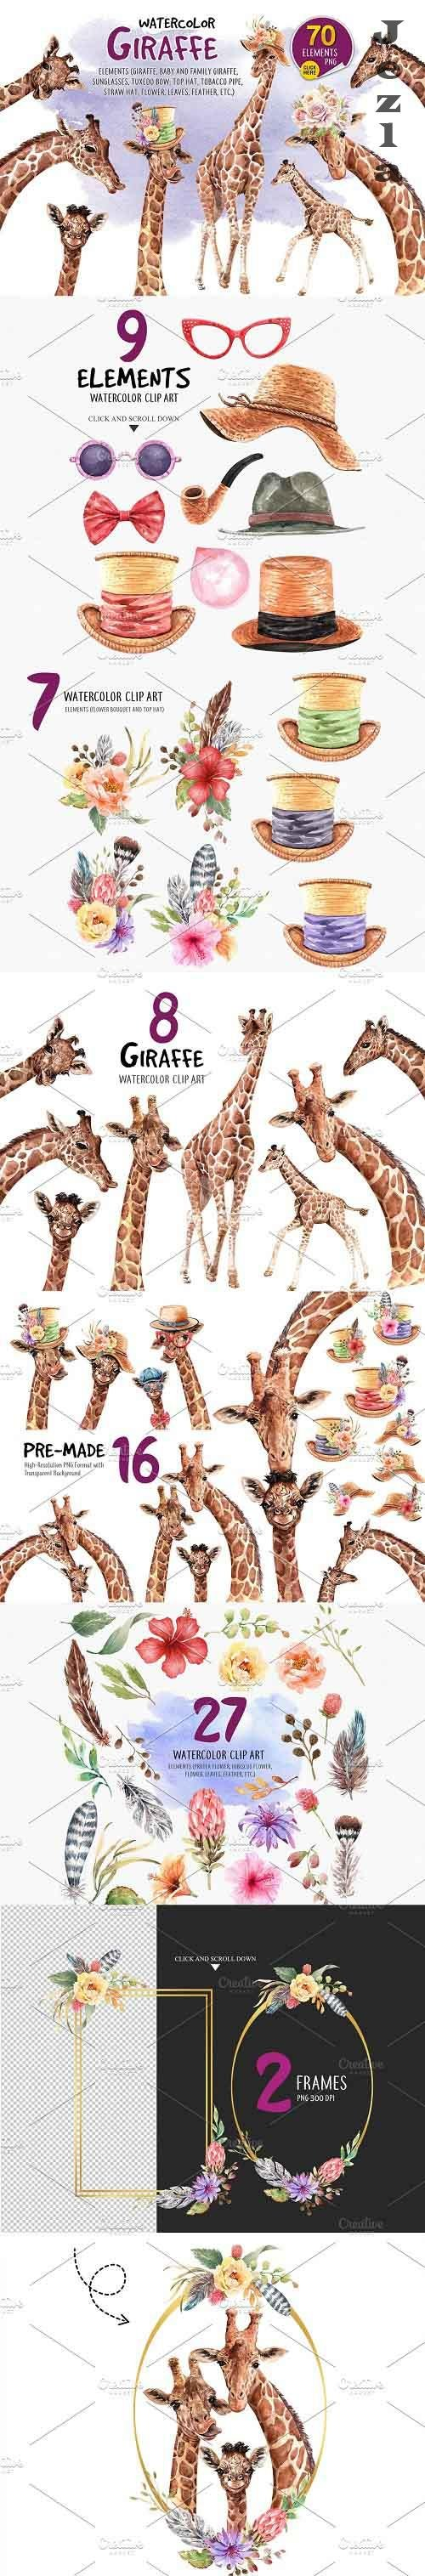 Giraffe watercolor, Paint clip art - 5154802